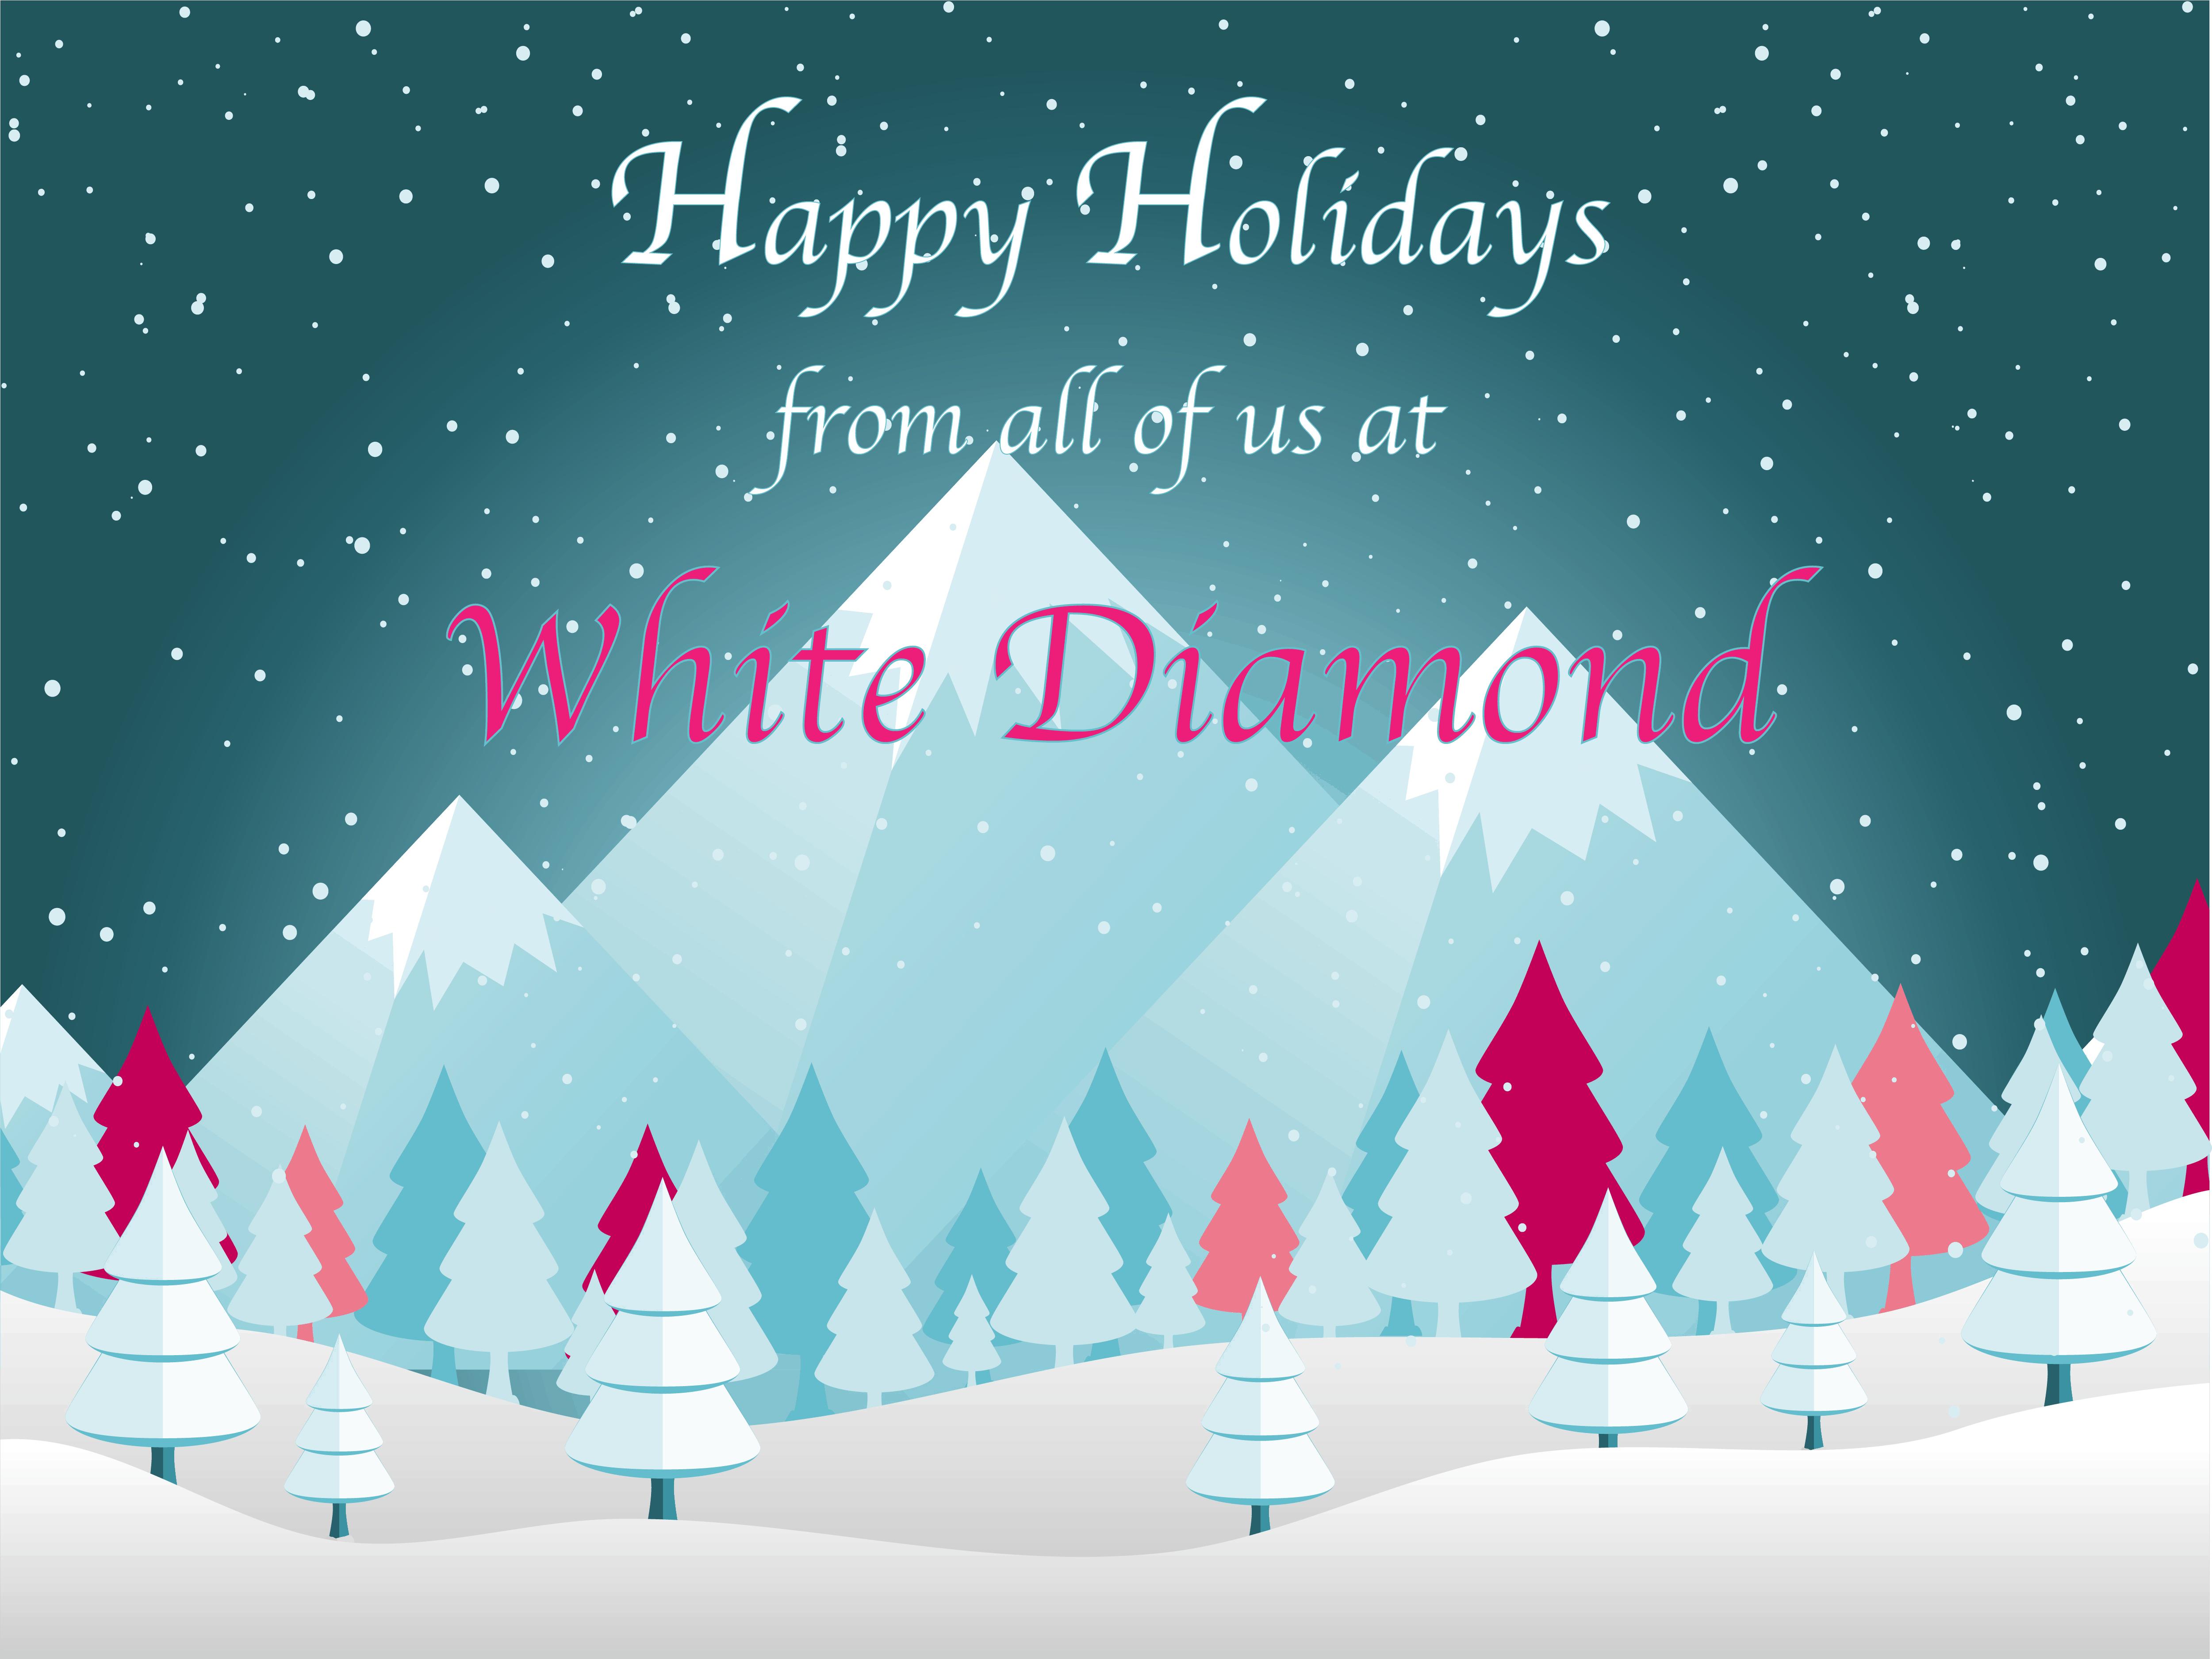 Happy Holidays from White Diamond